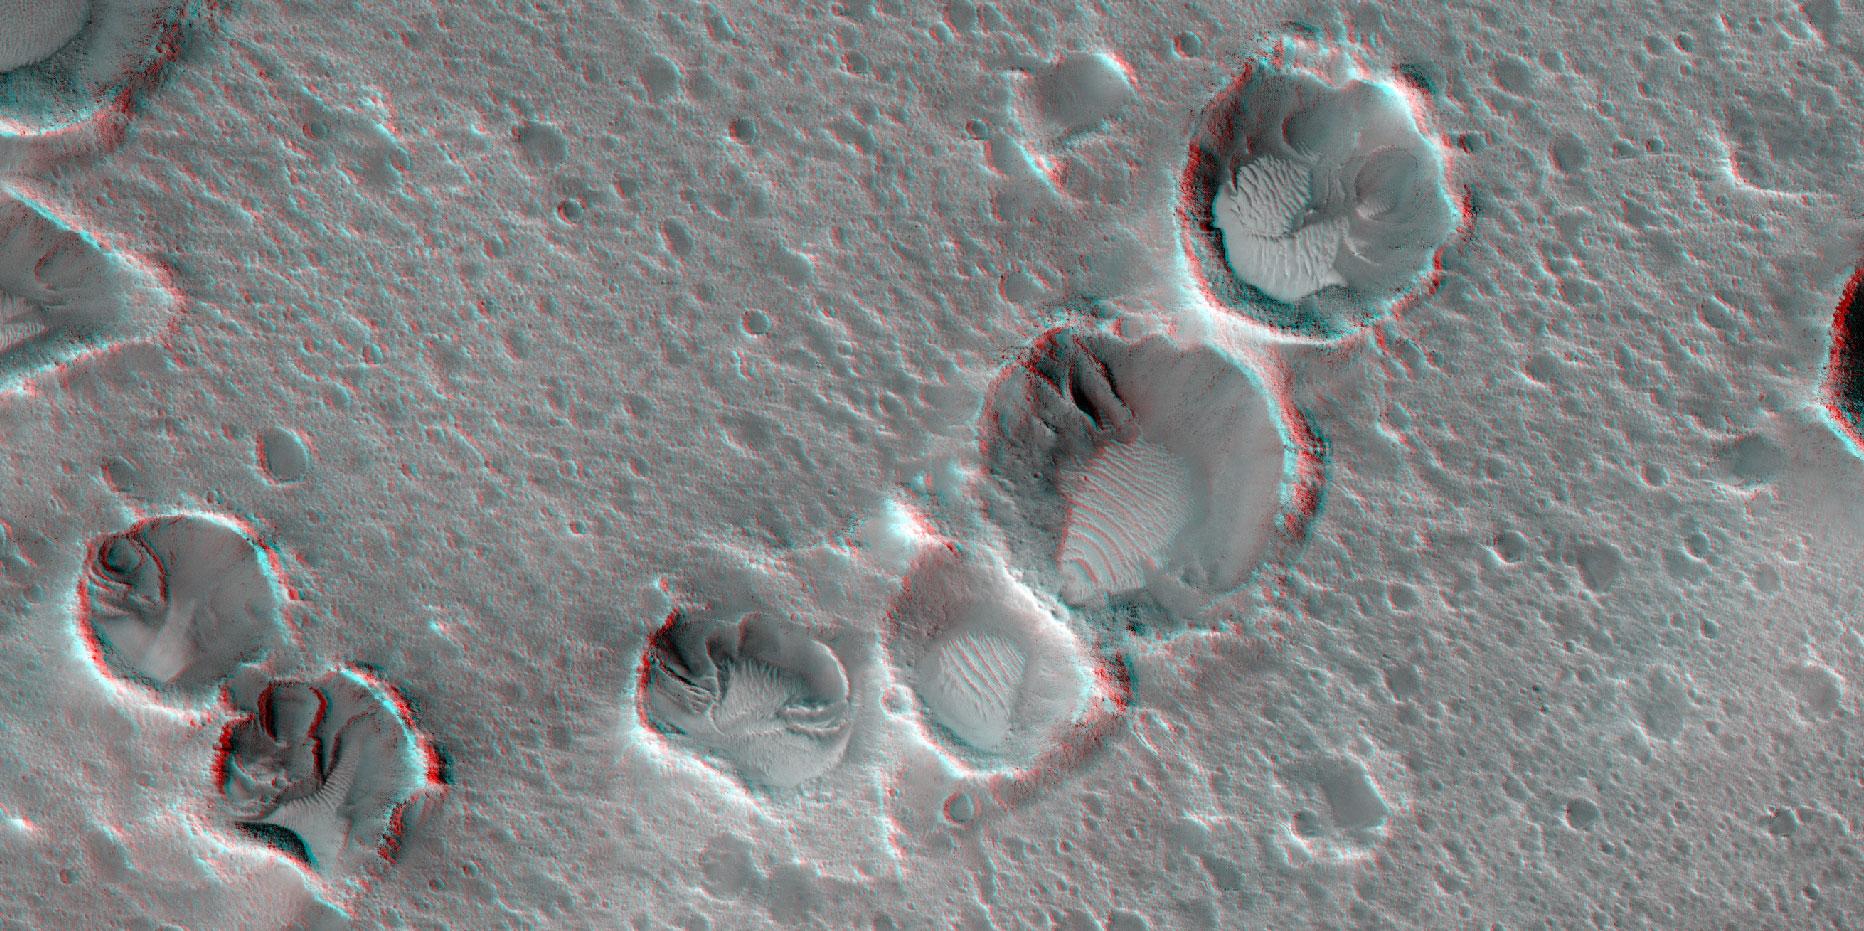 [NASA/JPL/University of Arizona]